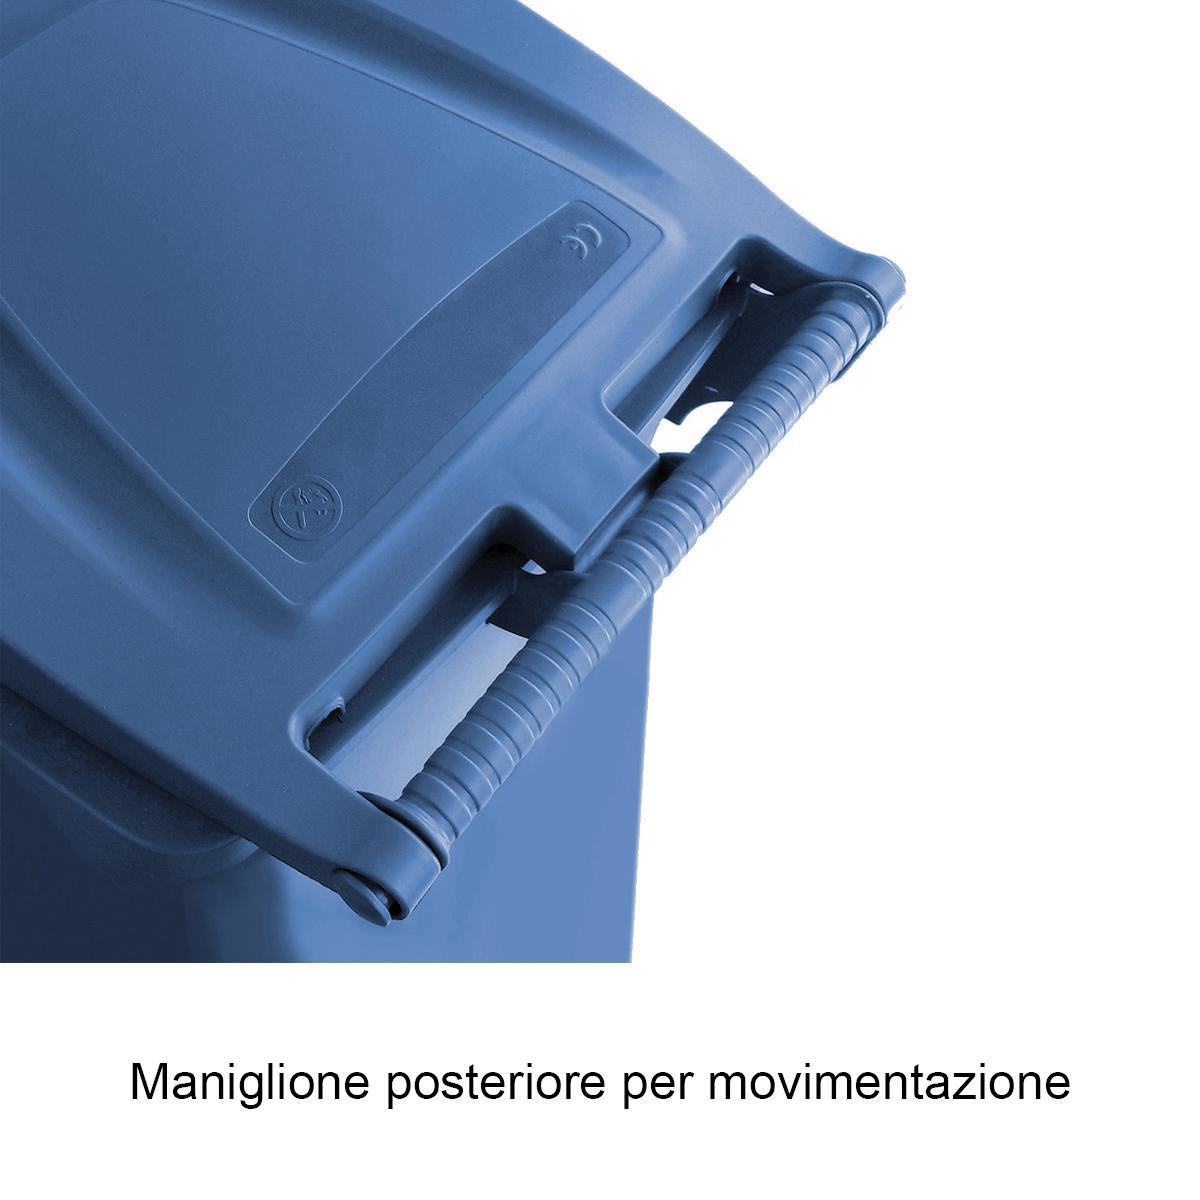 Bidone in plastica STEFANPLAST carrellato 120 L, 2 ruote - 2